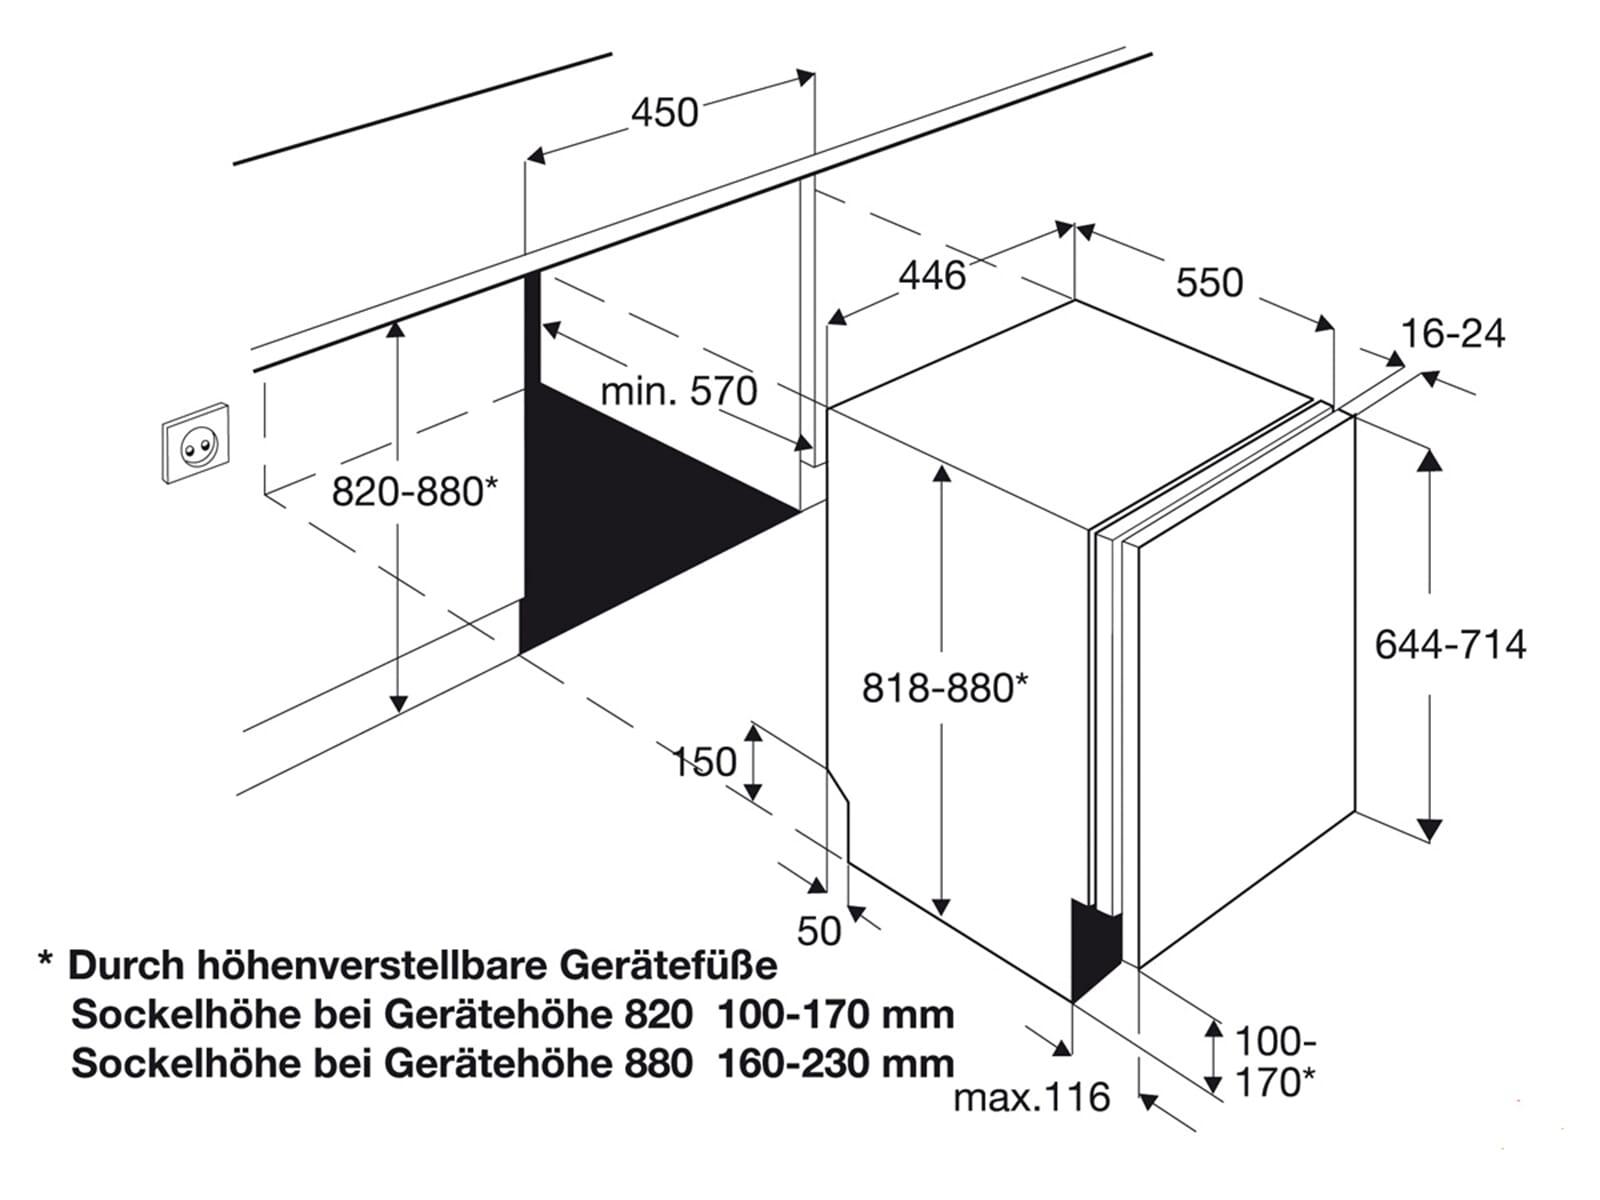 aeg f55410vi0 vollintegrierbarer einbaugeschirrsp ler sp lautomat sp ler 45cm a. Black Bedroom Furniture Sets. Home Design Ideas